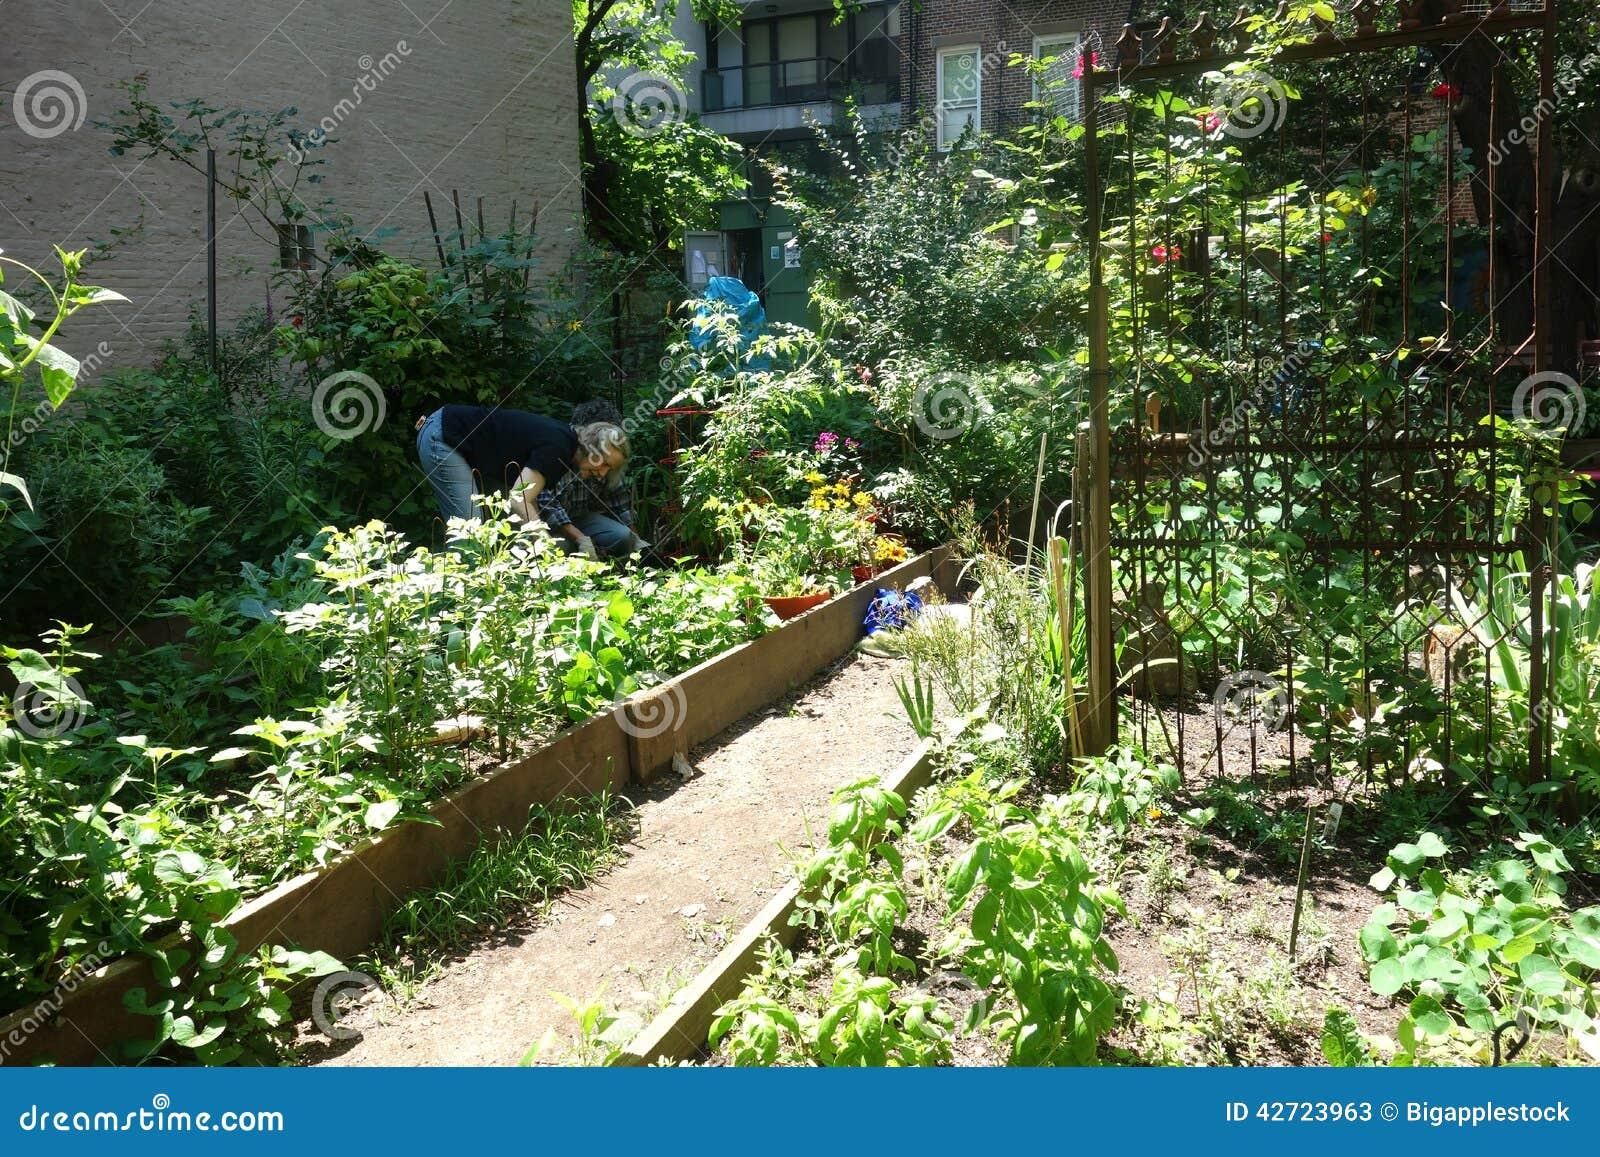 New York City Community Garden Editorial Stock Photo Image 42723963